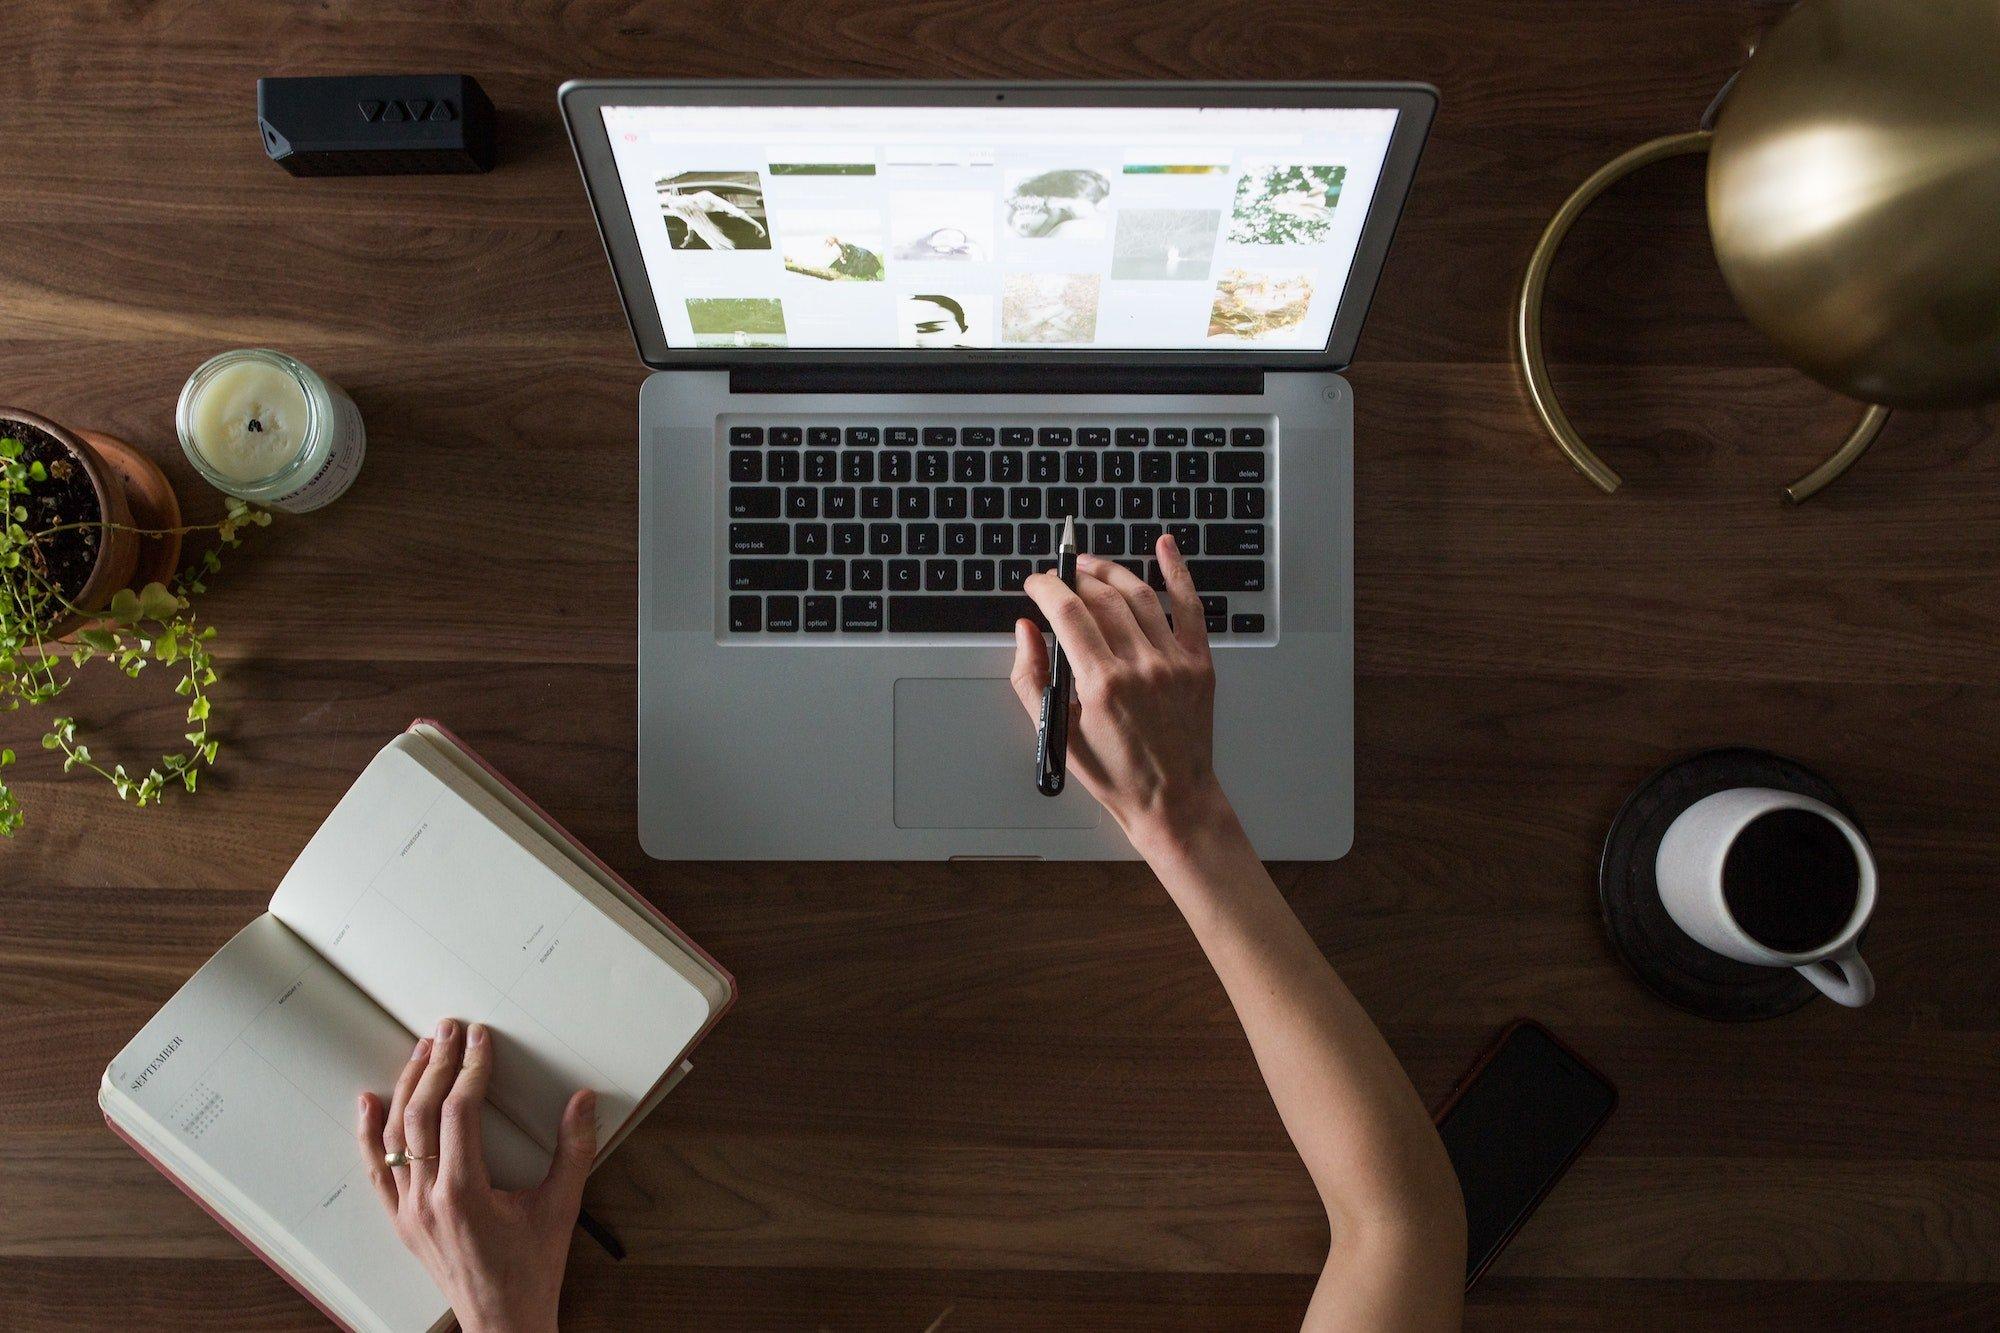 computer-desk-hand-laptop-374631